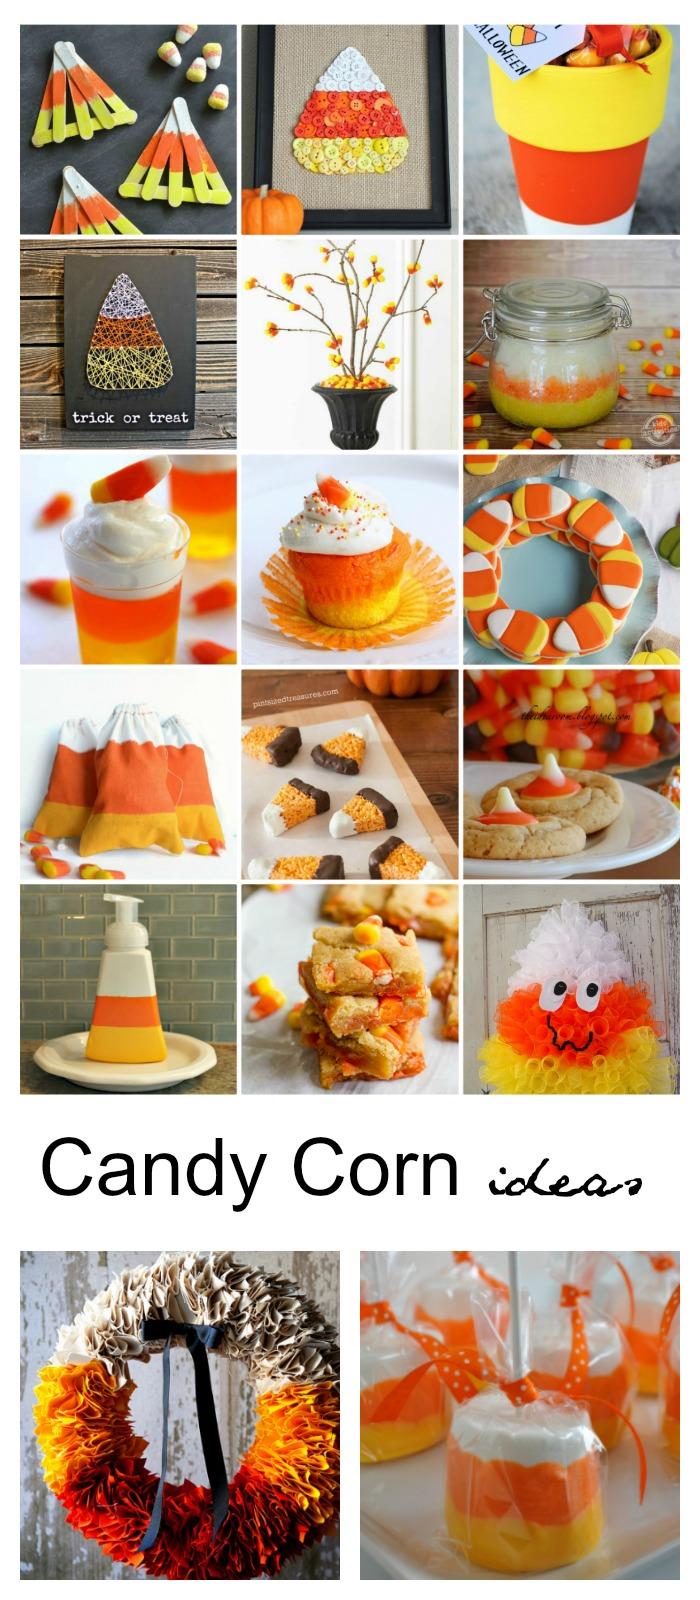 candy-corn-treats-crafts-pin